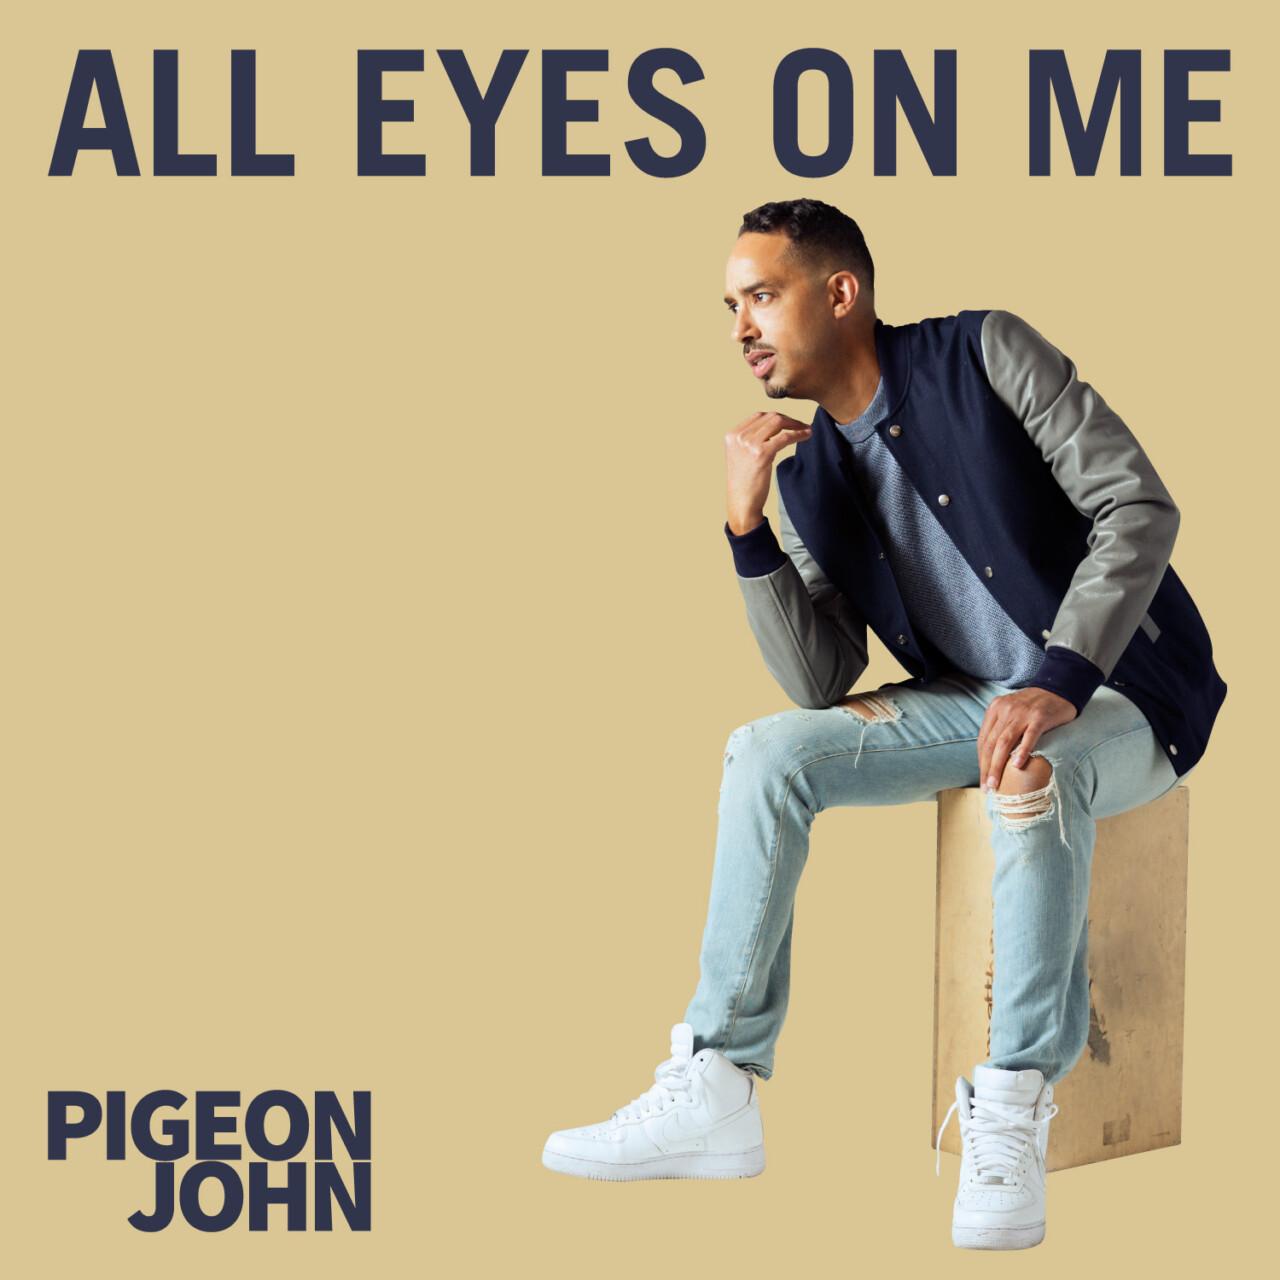 Pigeon John - All Eyes On Me